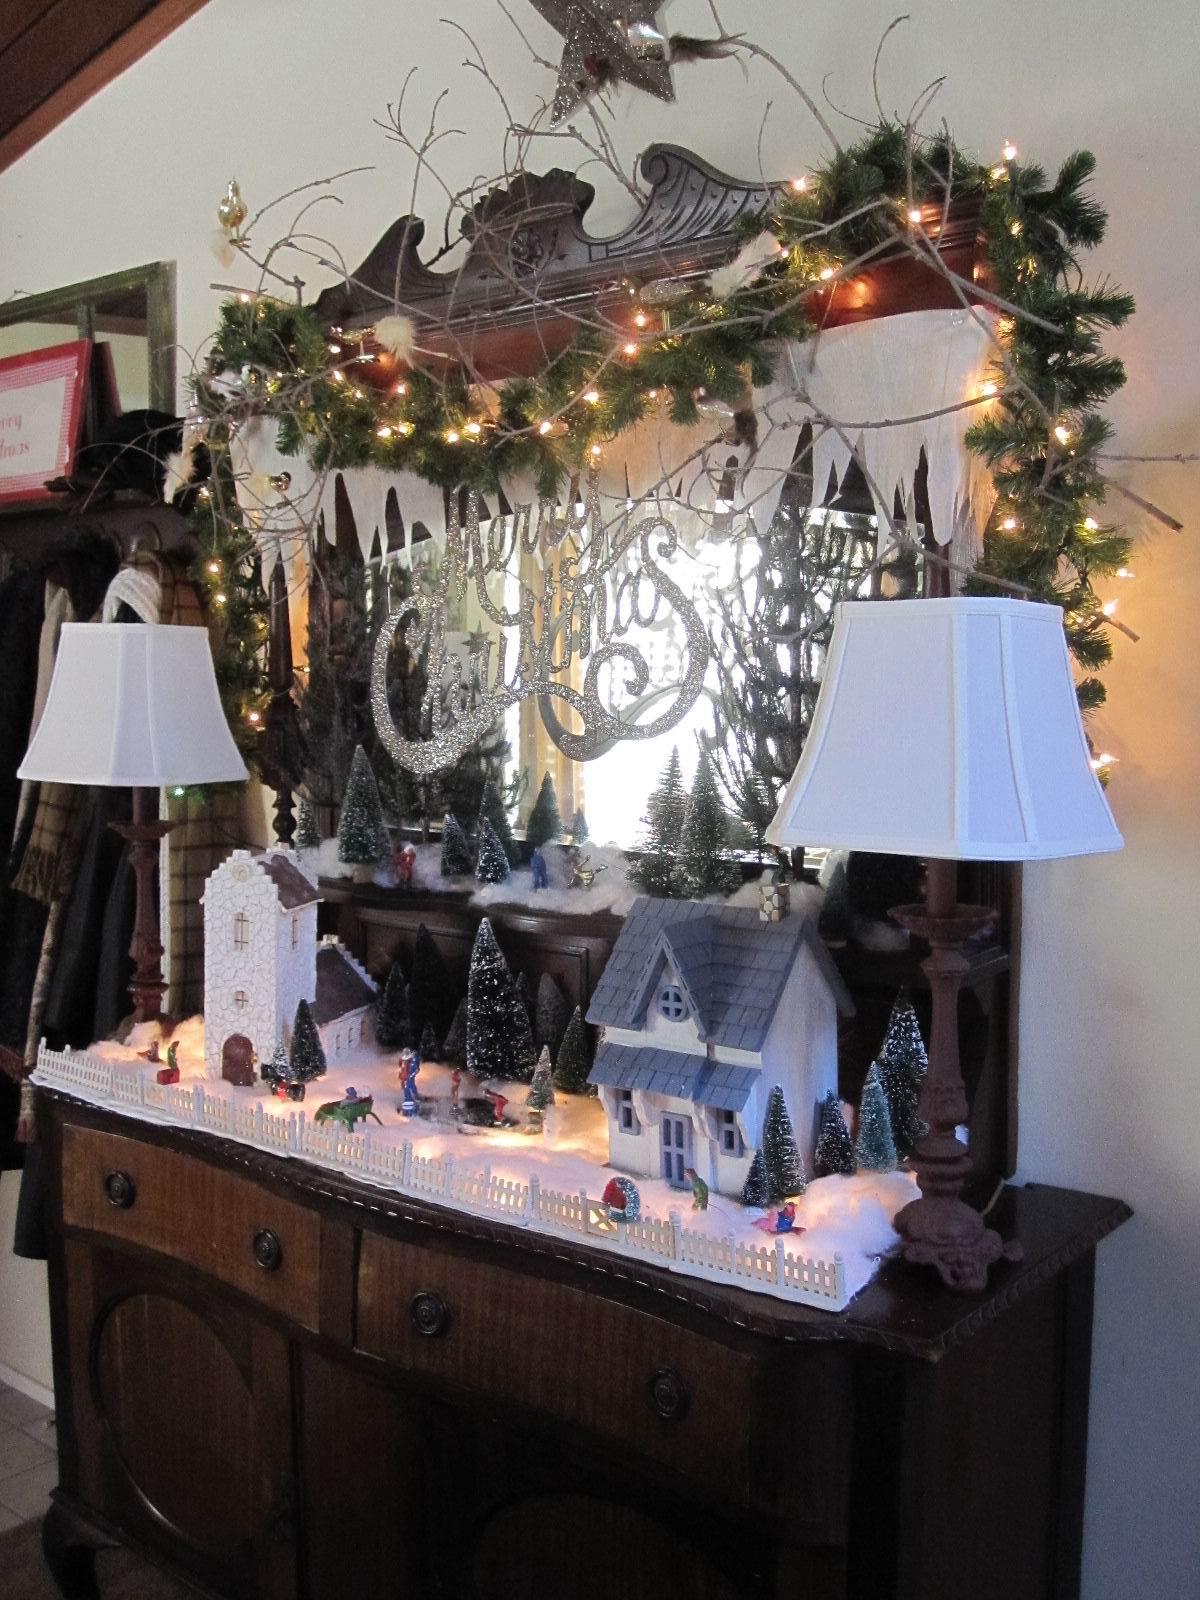 Merry Little Christmas 2011.Little Pink Houses Merry Little Christmas